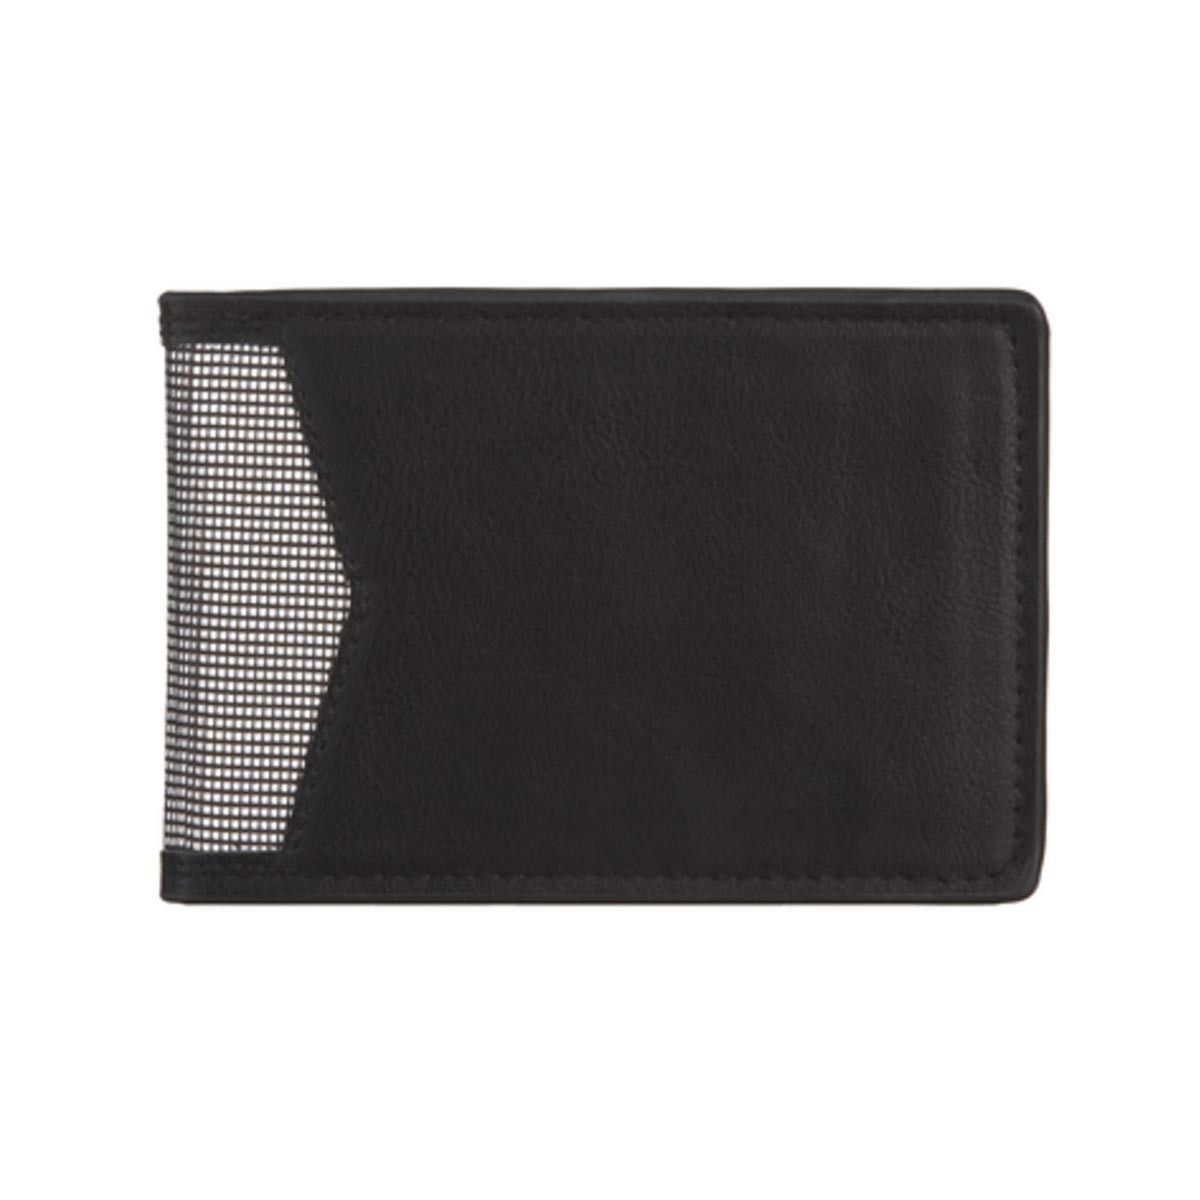 Rfid steel style wallet black wallet steel style